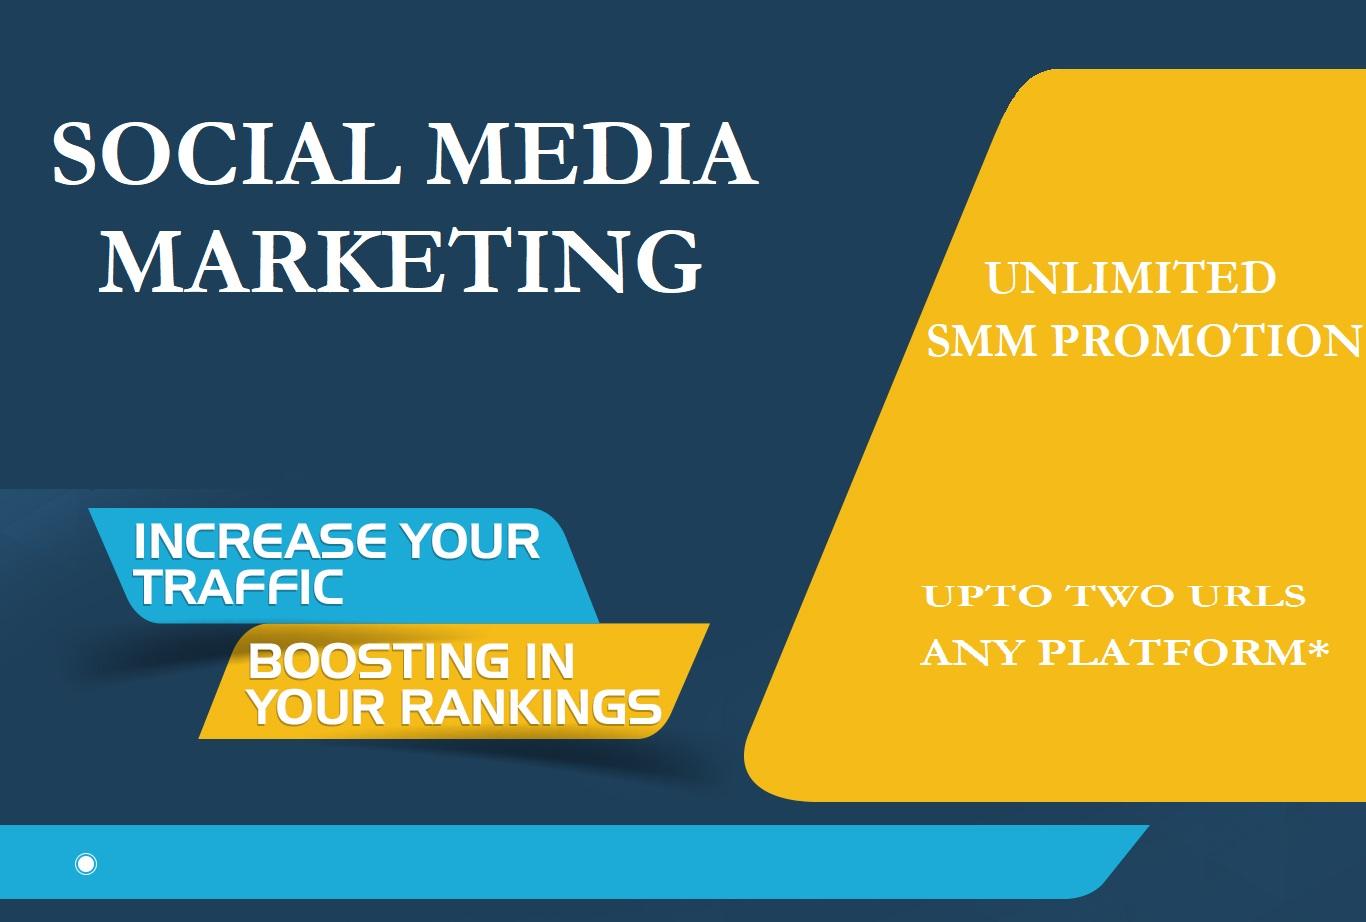 Social Media Marketing Any Platform Superfast and Effective Reach